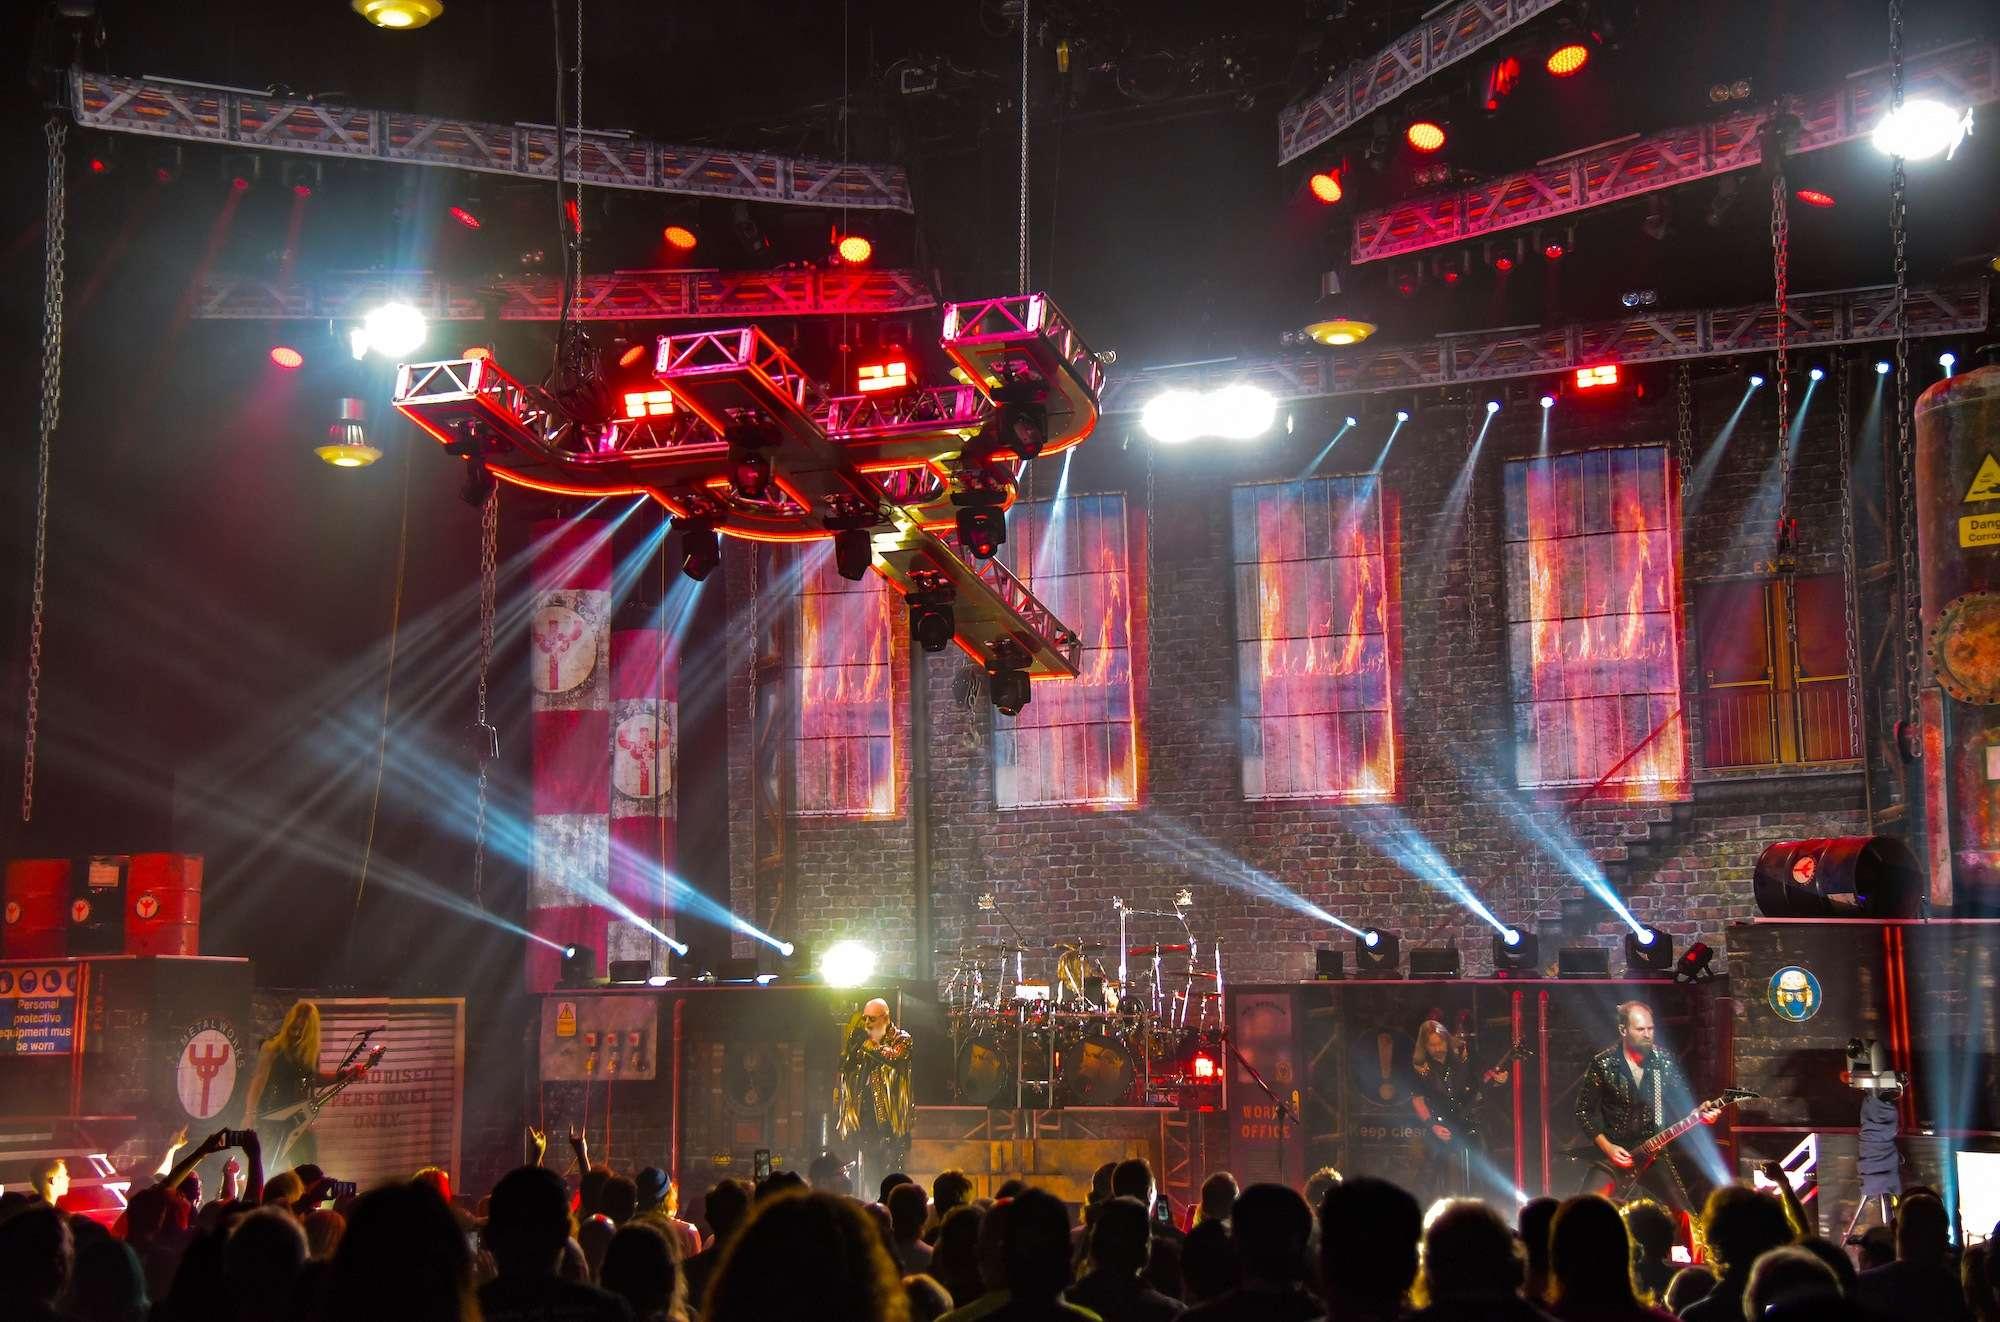 Judas Priest Live at Rosemont Theatre [GALLERY] 22